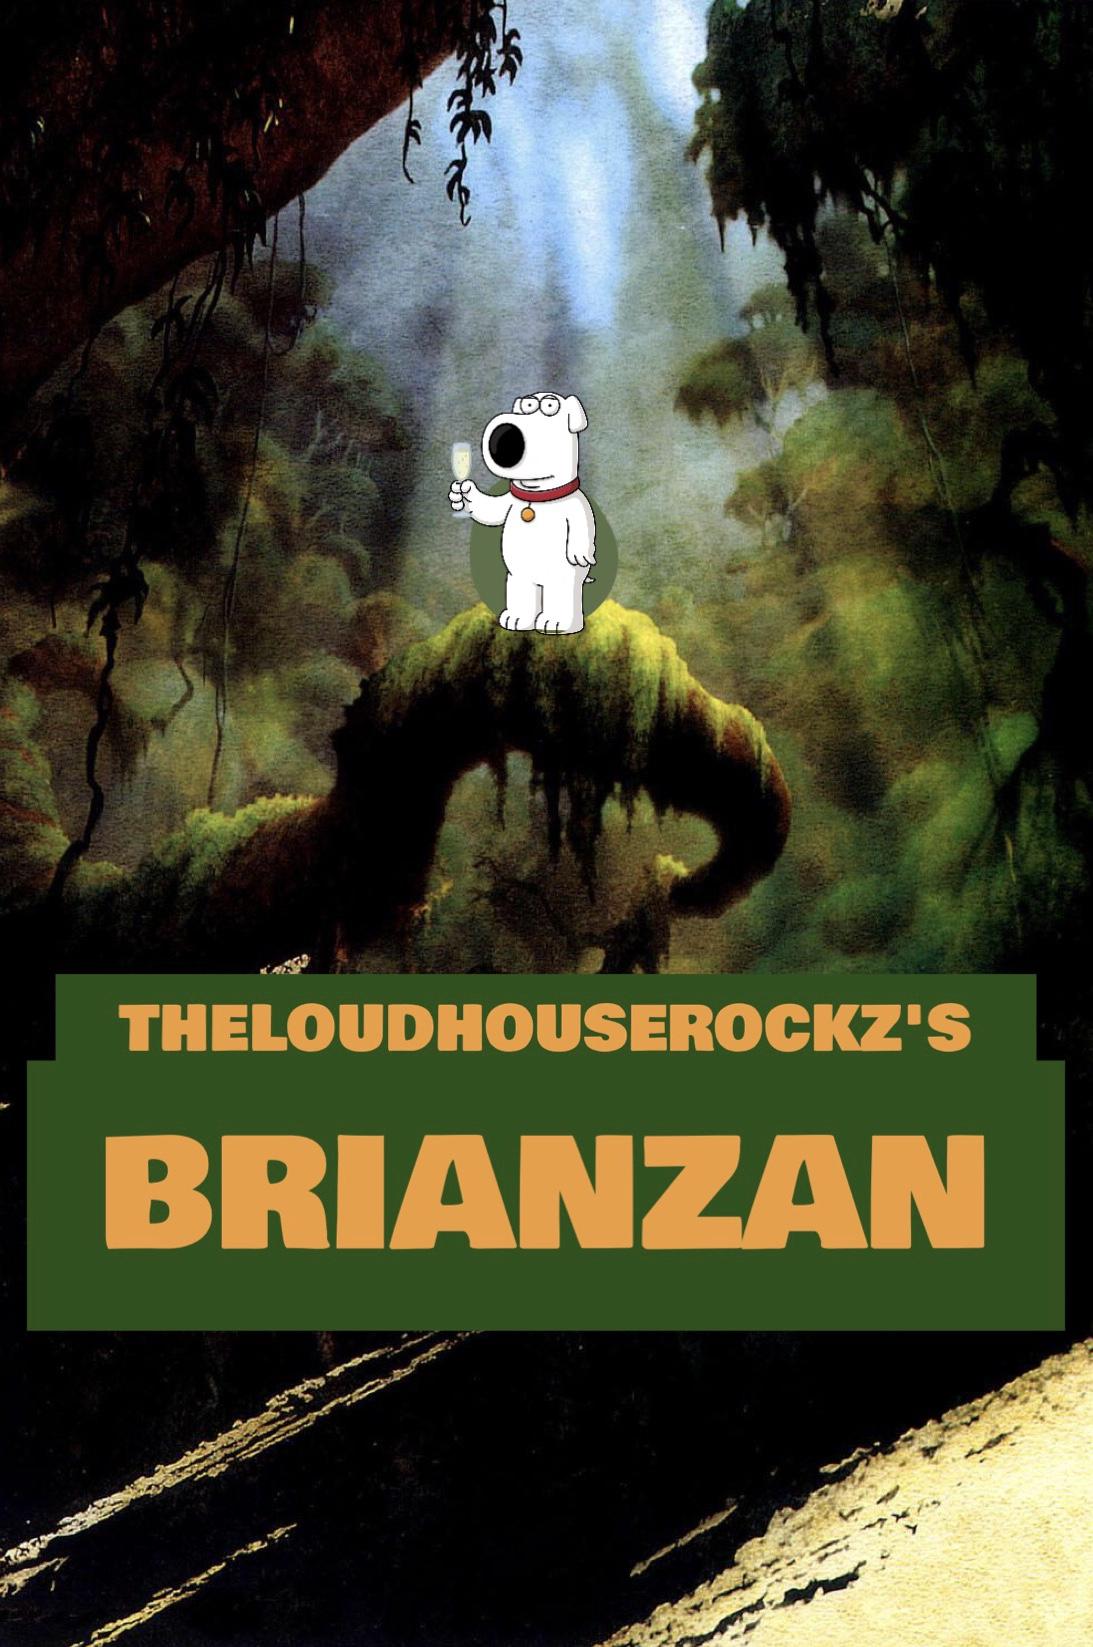 Brianzan